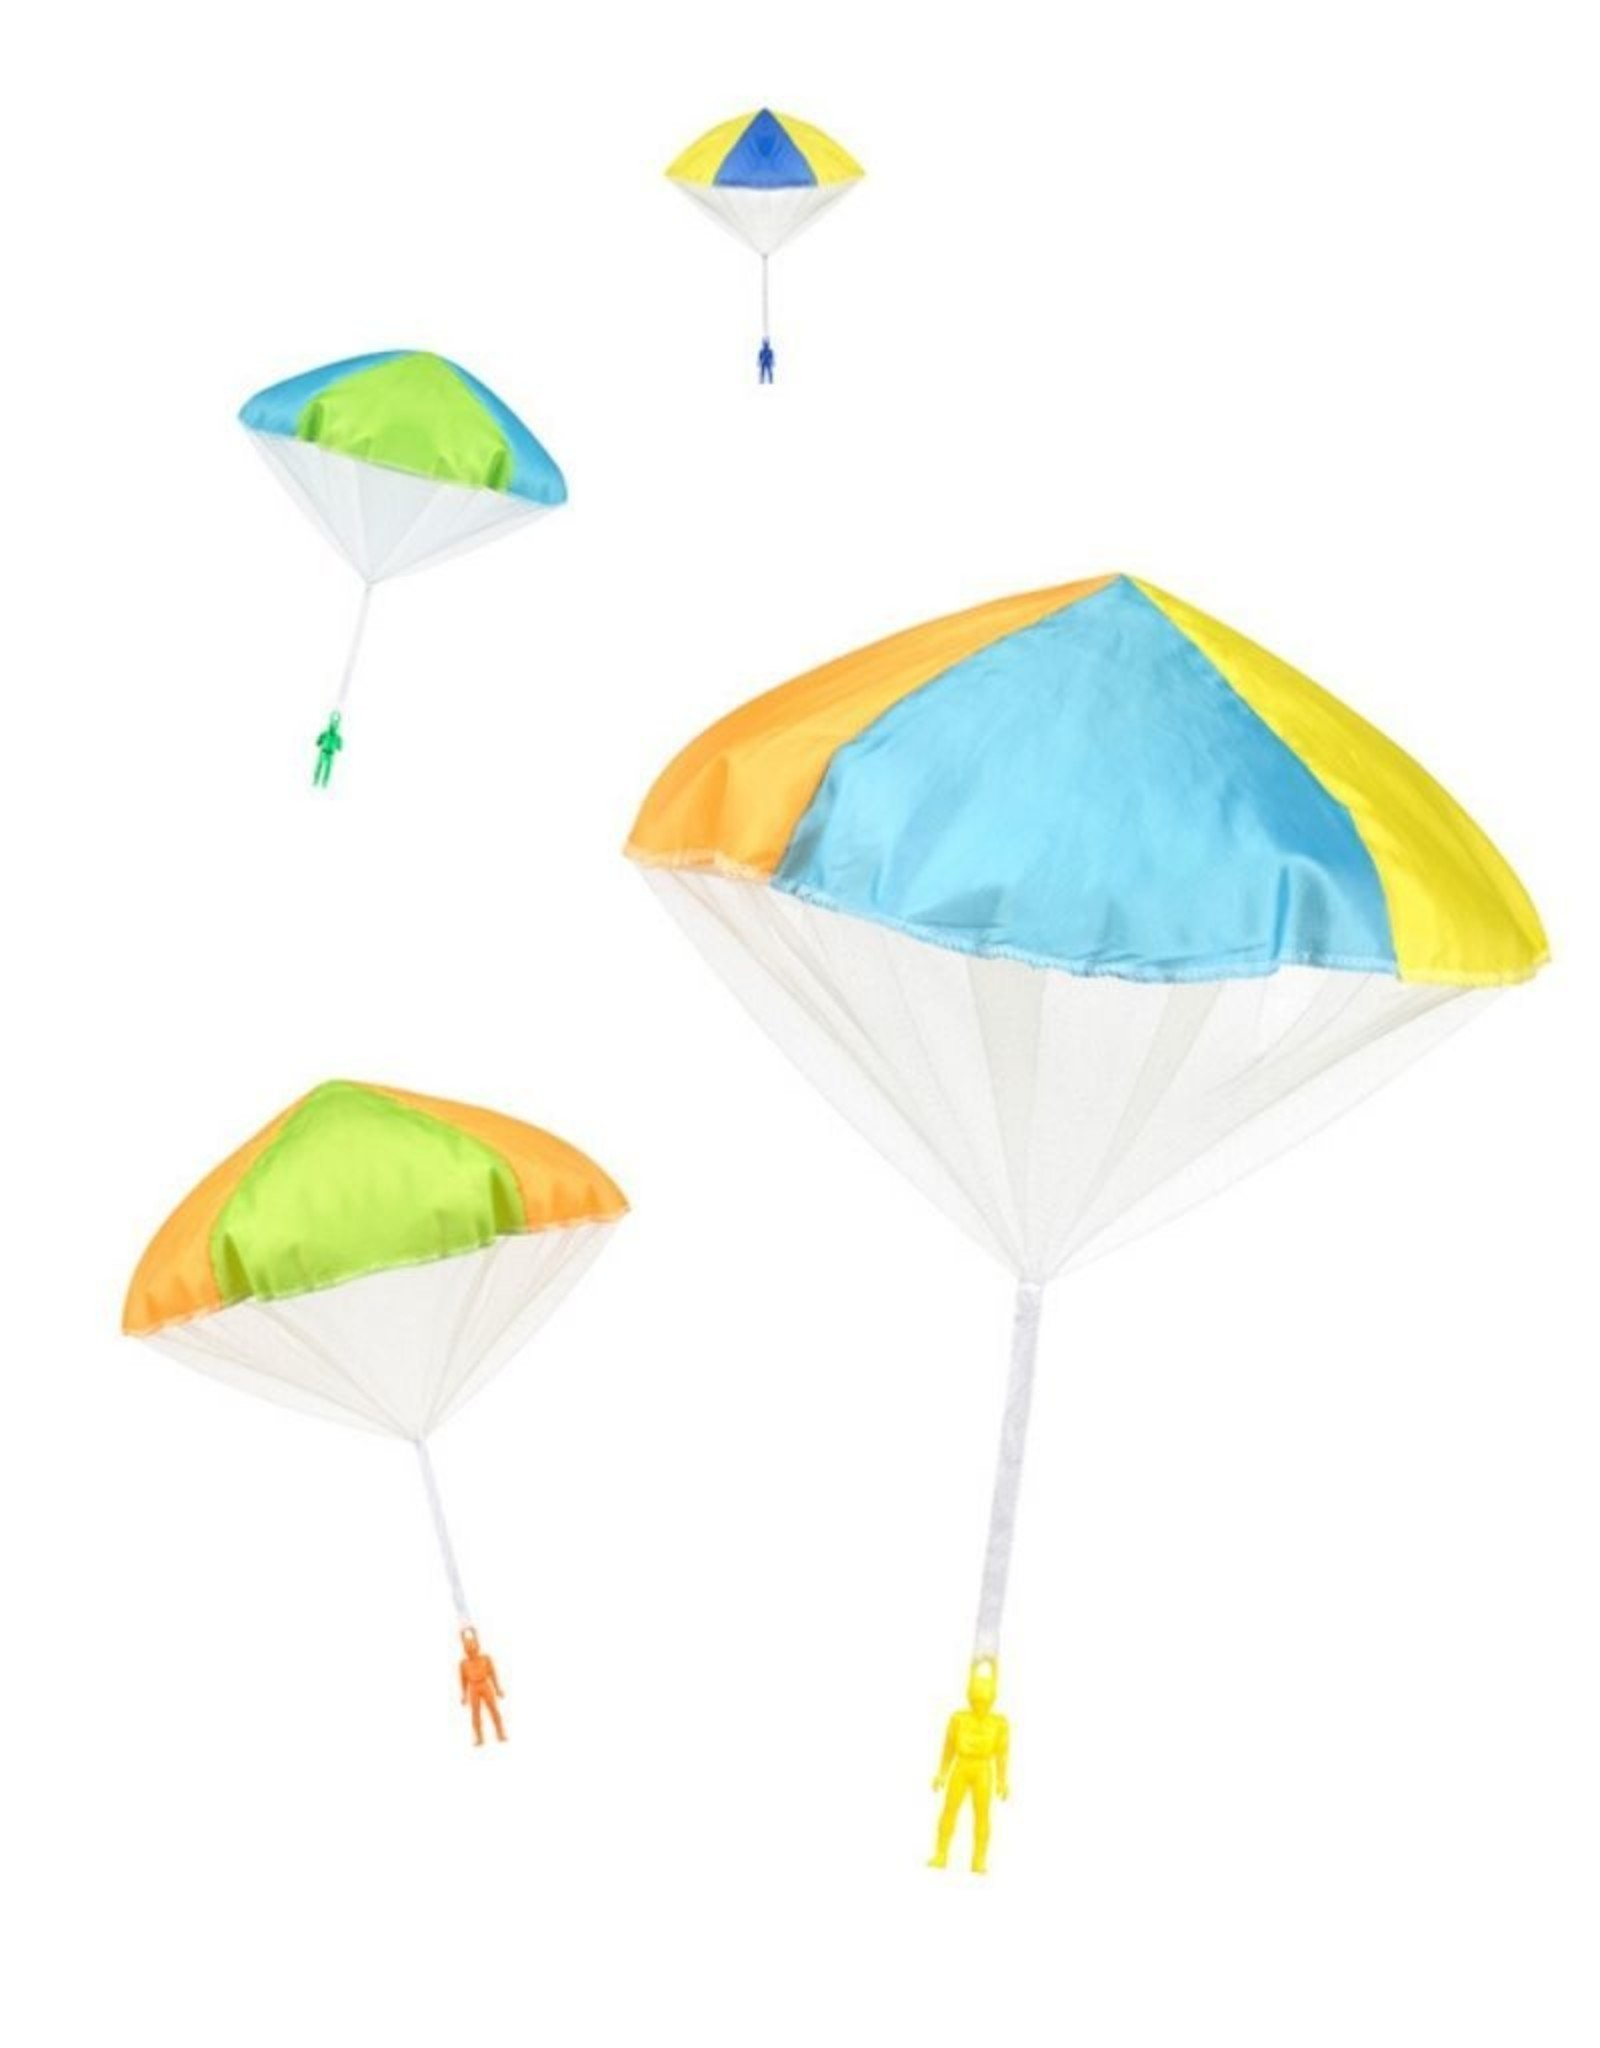 Aeromax 2000 Toy Parachute